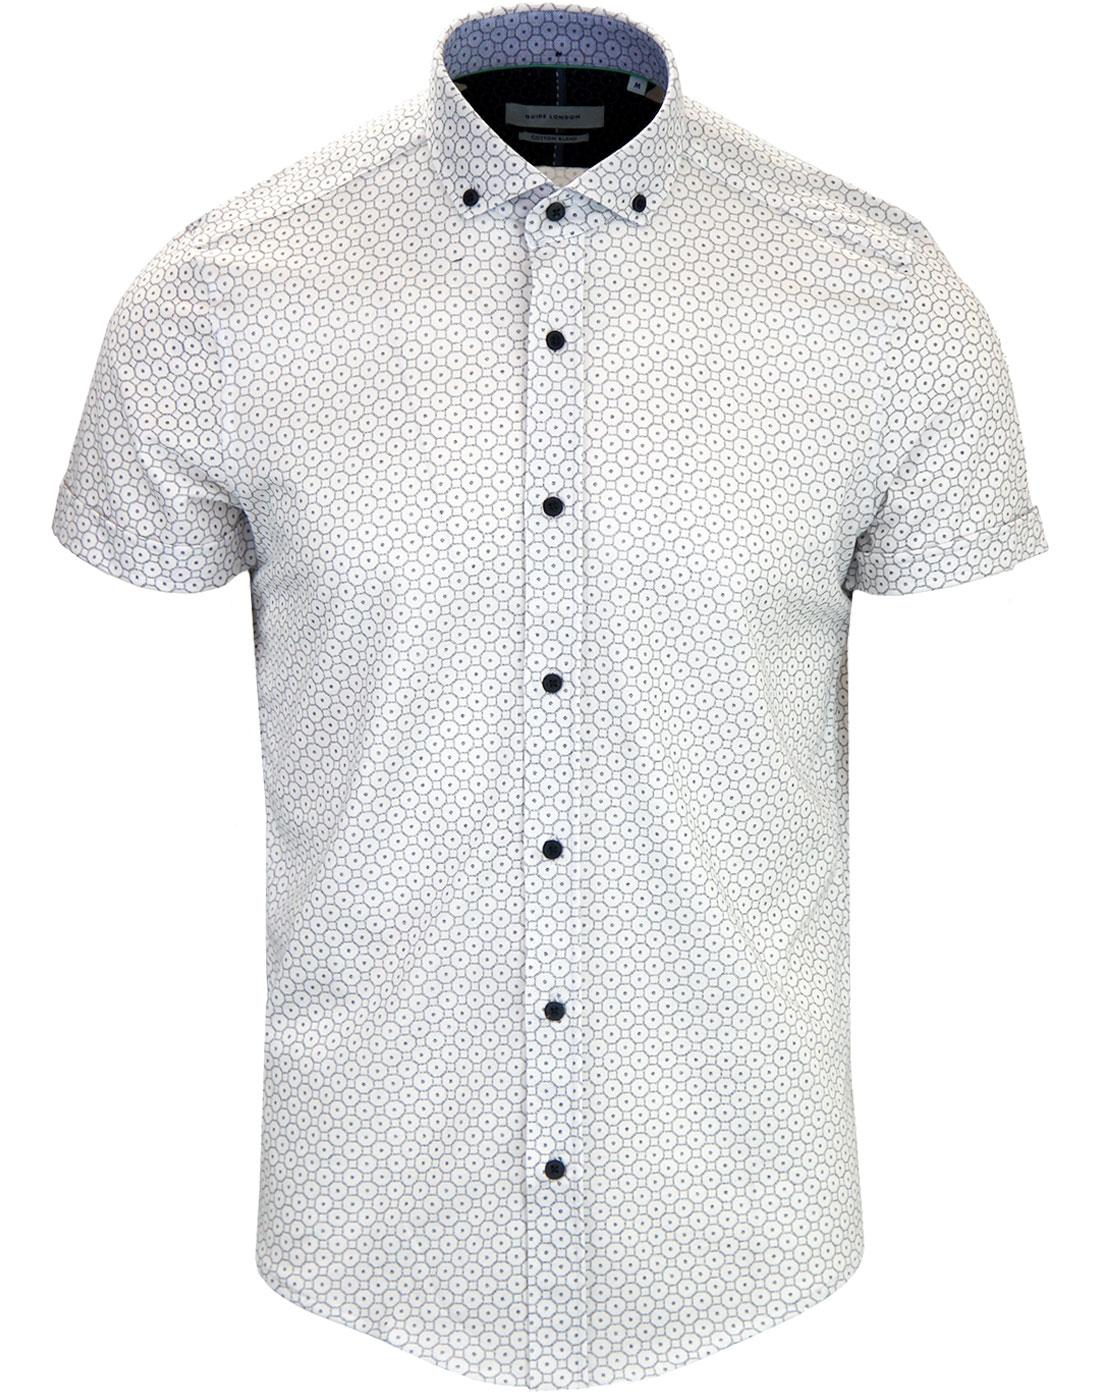 GUIDE LONDON Retro 60's Op Art Pique Shirt WHITE